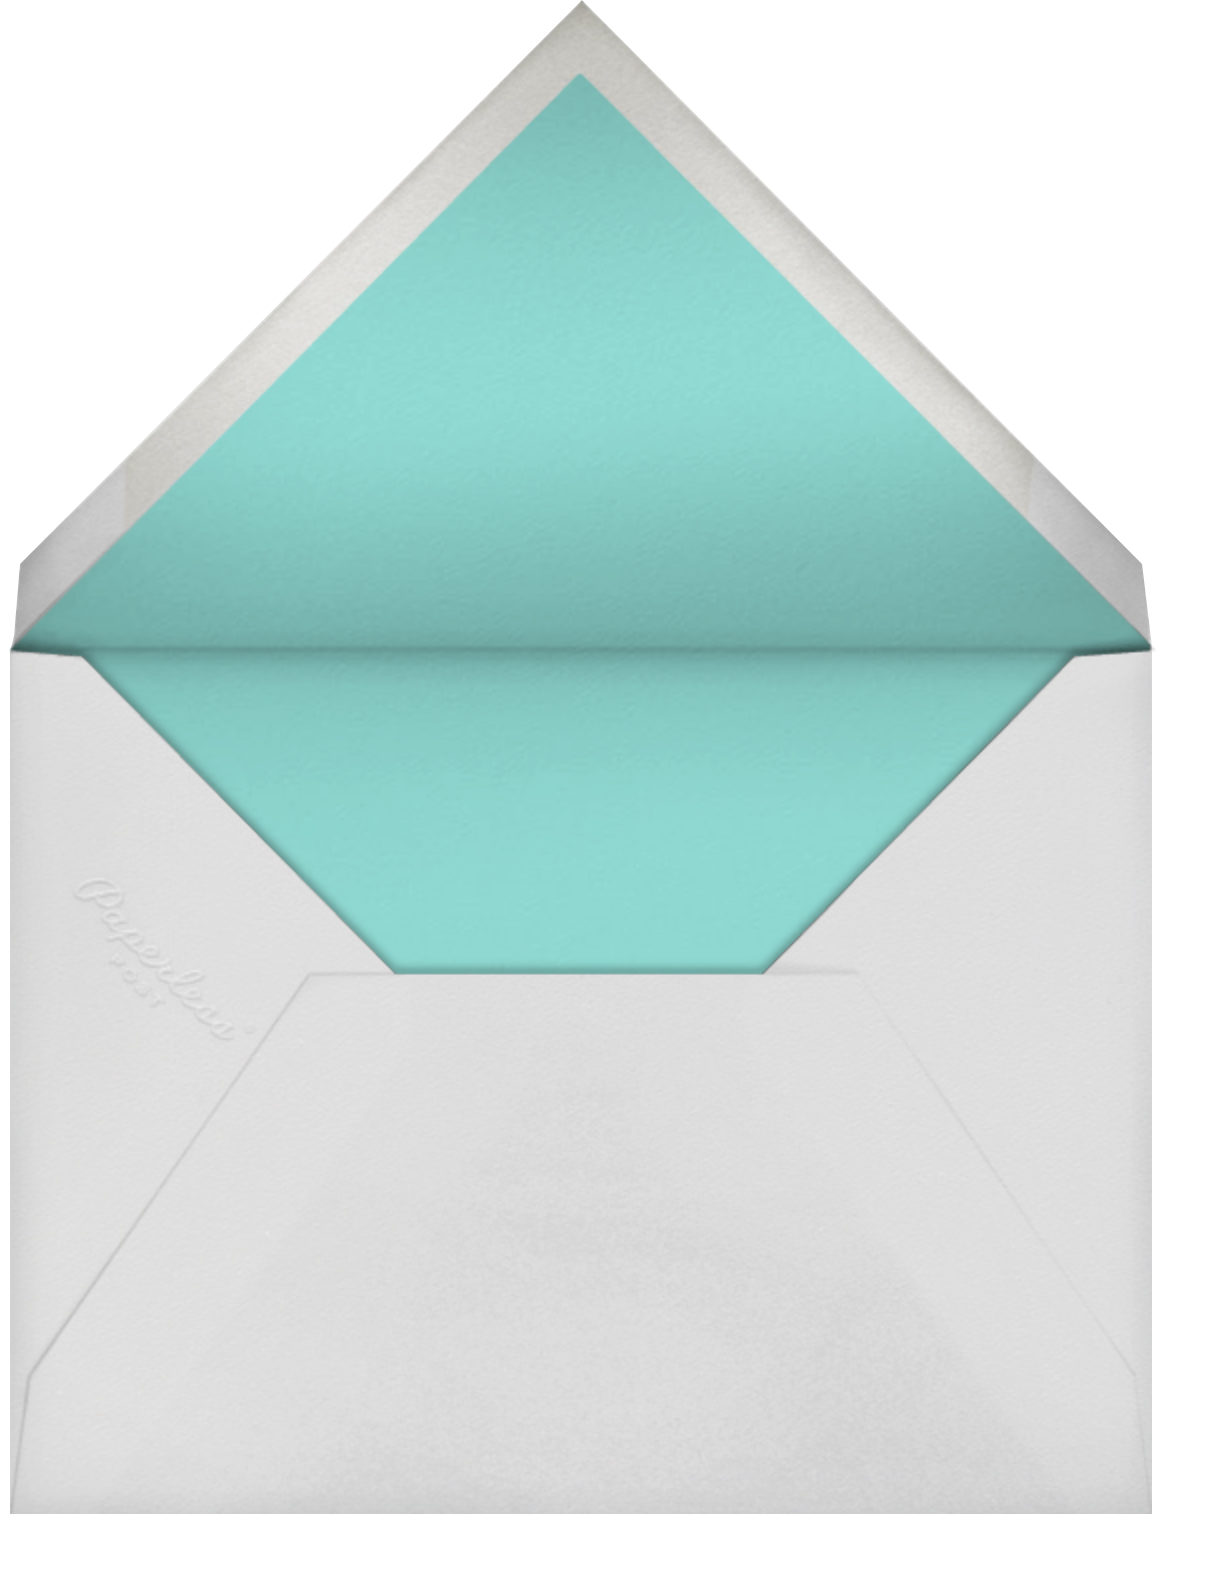 Ocean Wave - Gray Malin - Adult birthday - envelope back